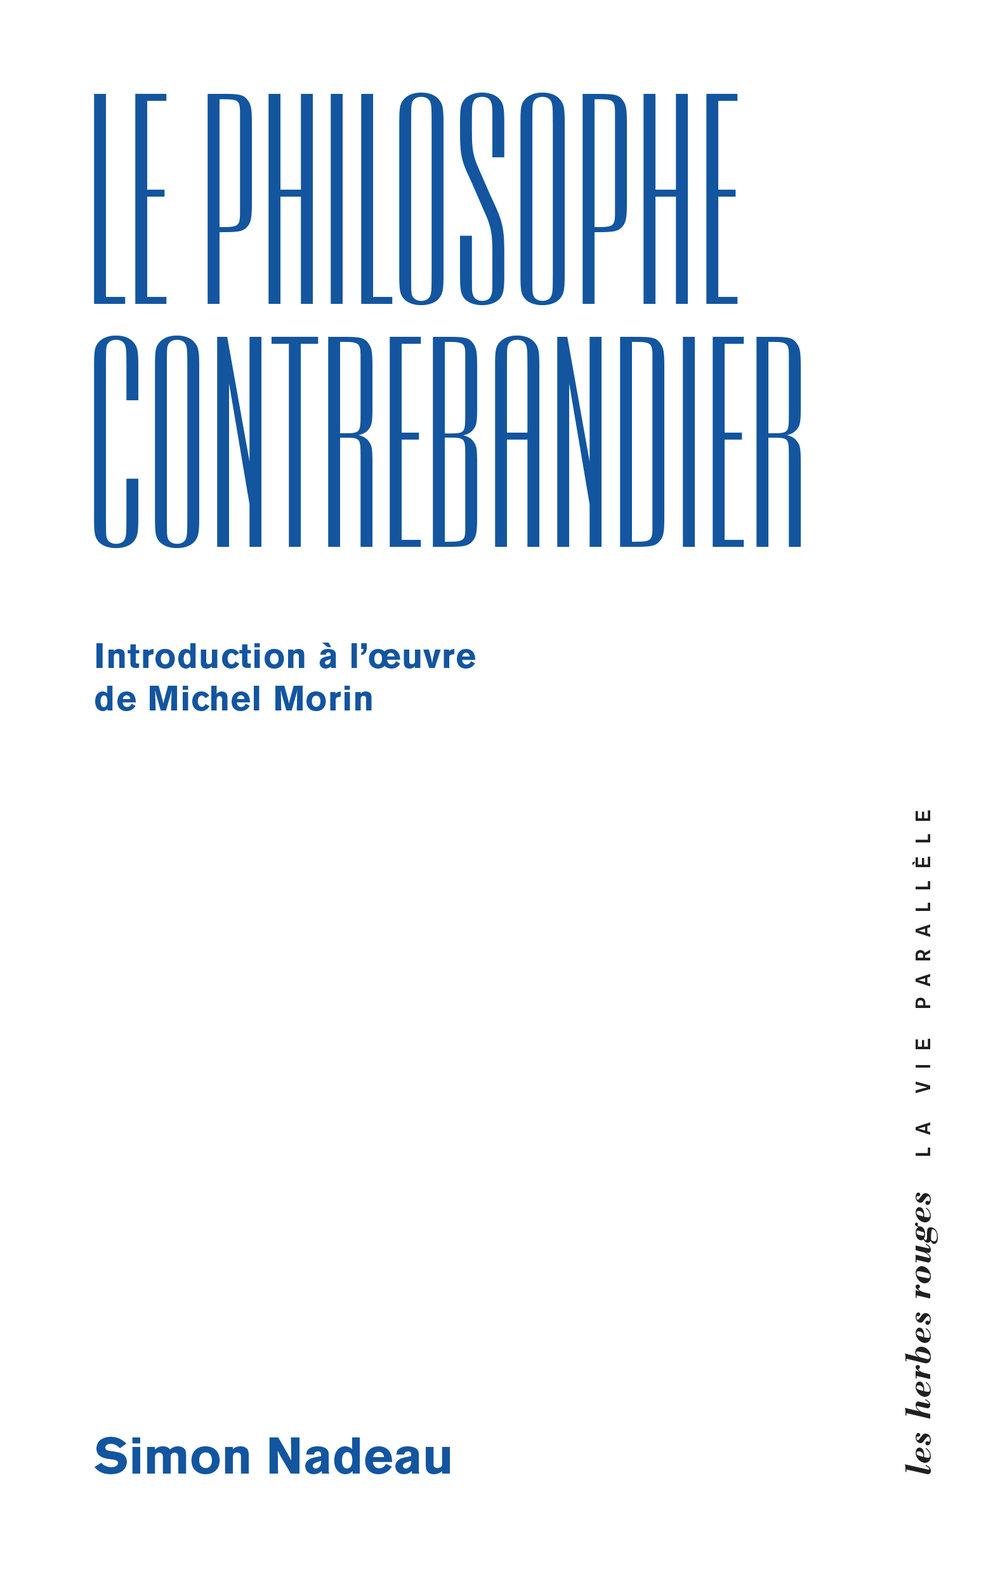 ISBN:978-2-89419-477-5 ISBN: 978-2-89419-478-2 (epub) ISBN: 978-2-89419-479-9 (pdf)